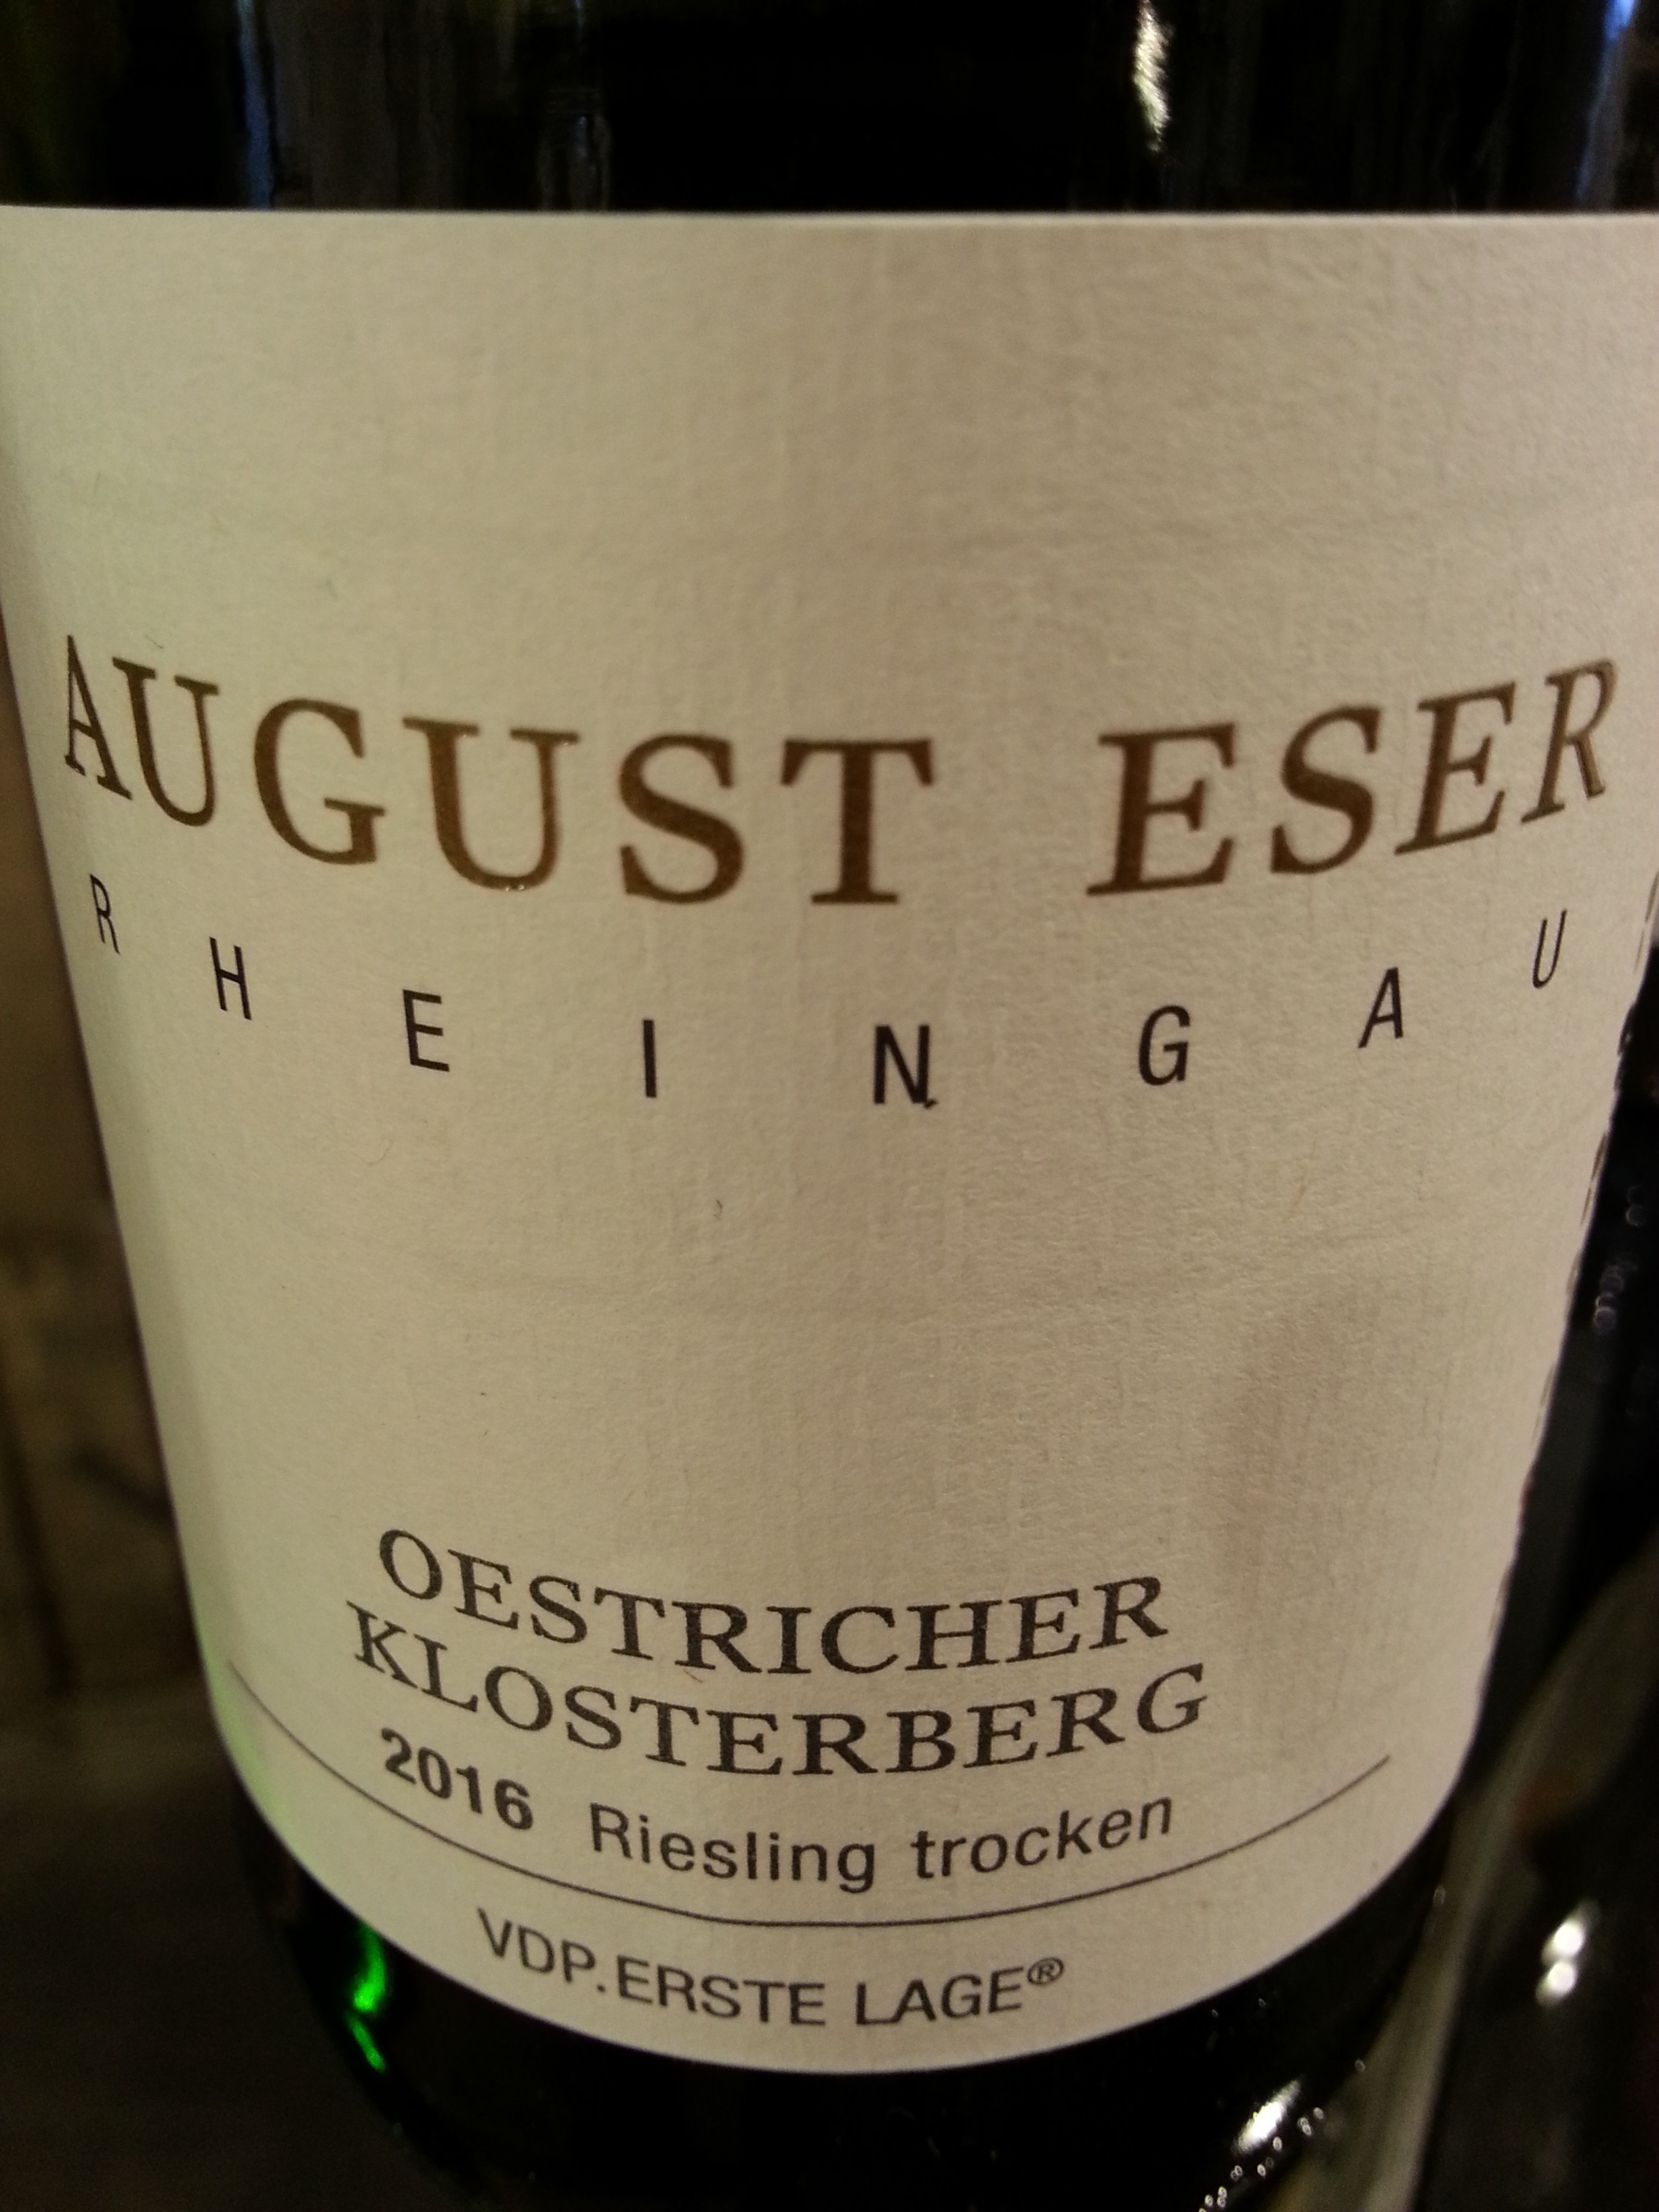 2016 Riesling Oestricher Klosterberg | Eser